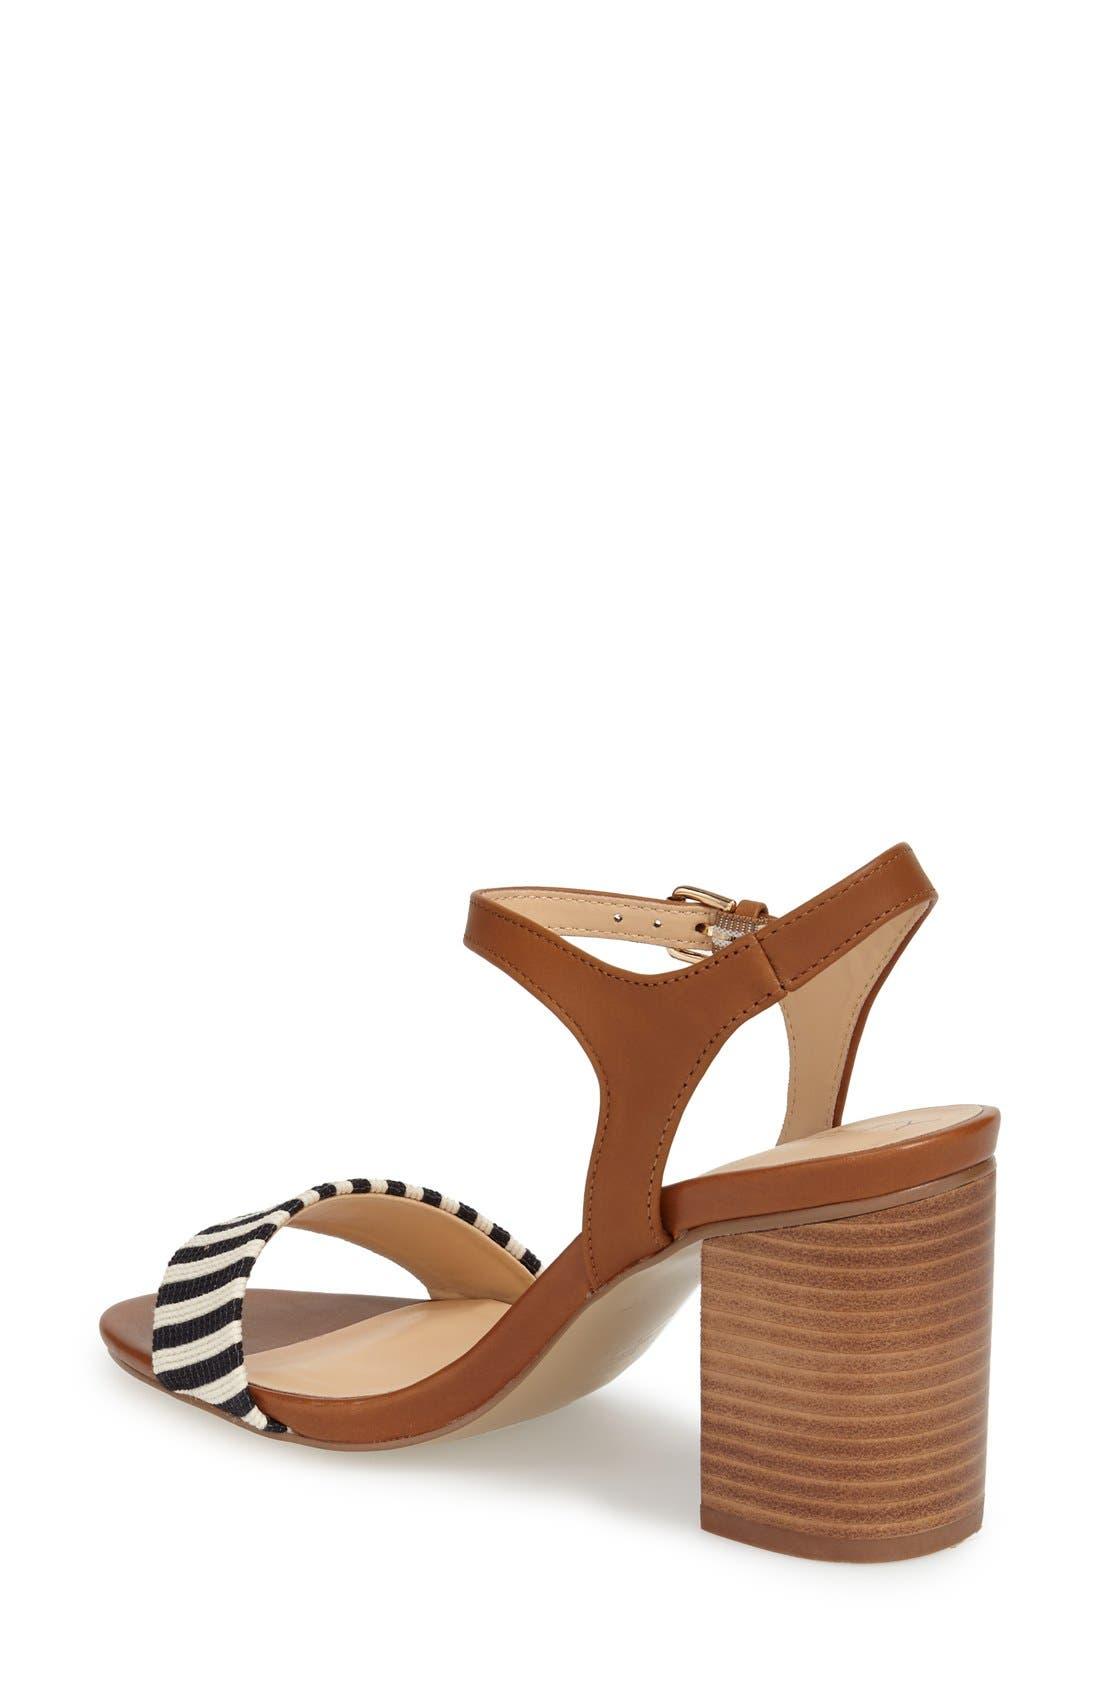 'Linny' Ankle Strap Sandal,                             Alternate thumbnail 16, color,